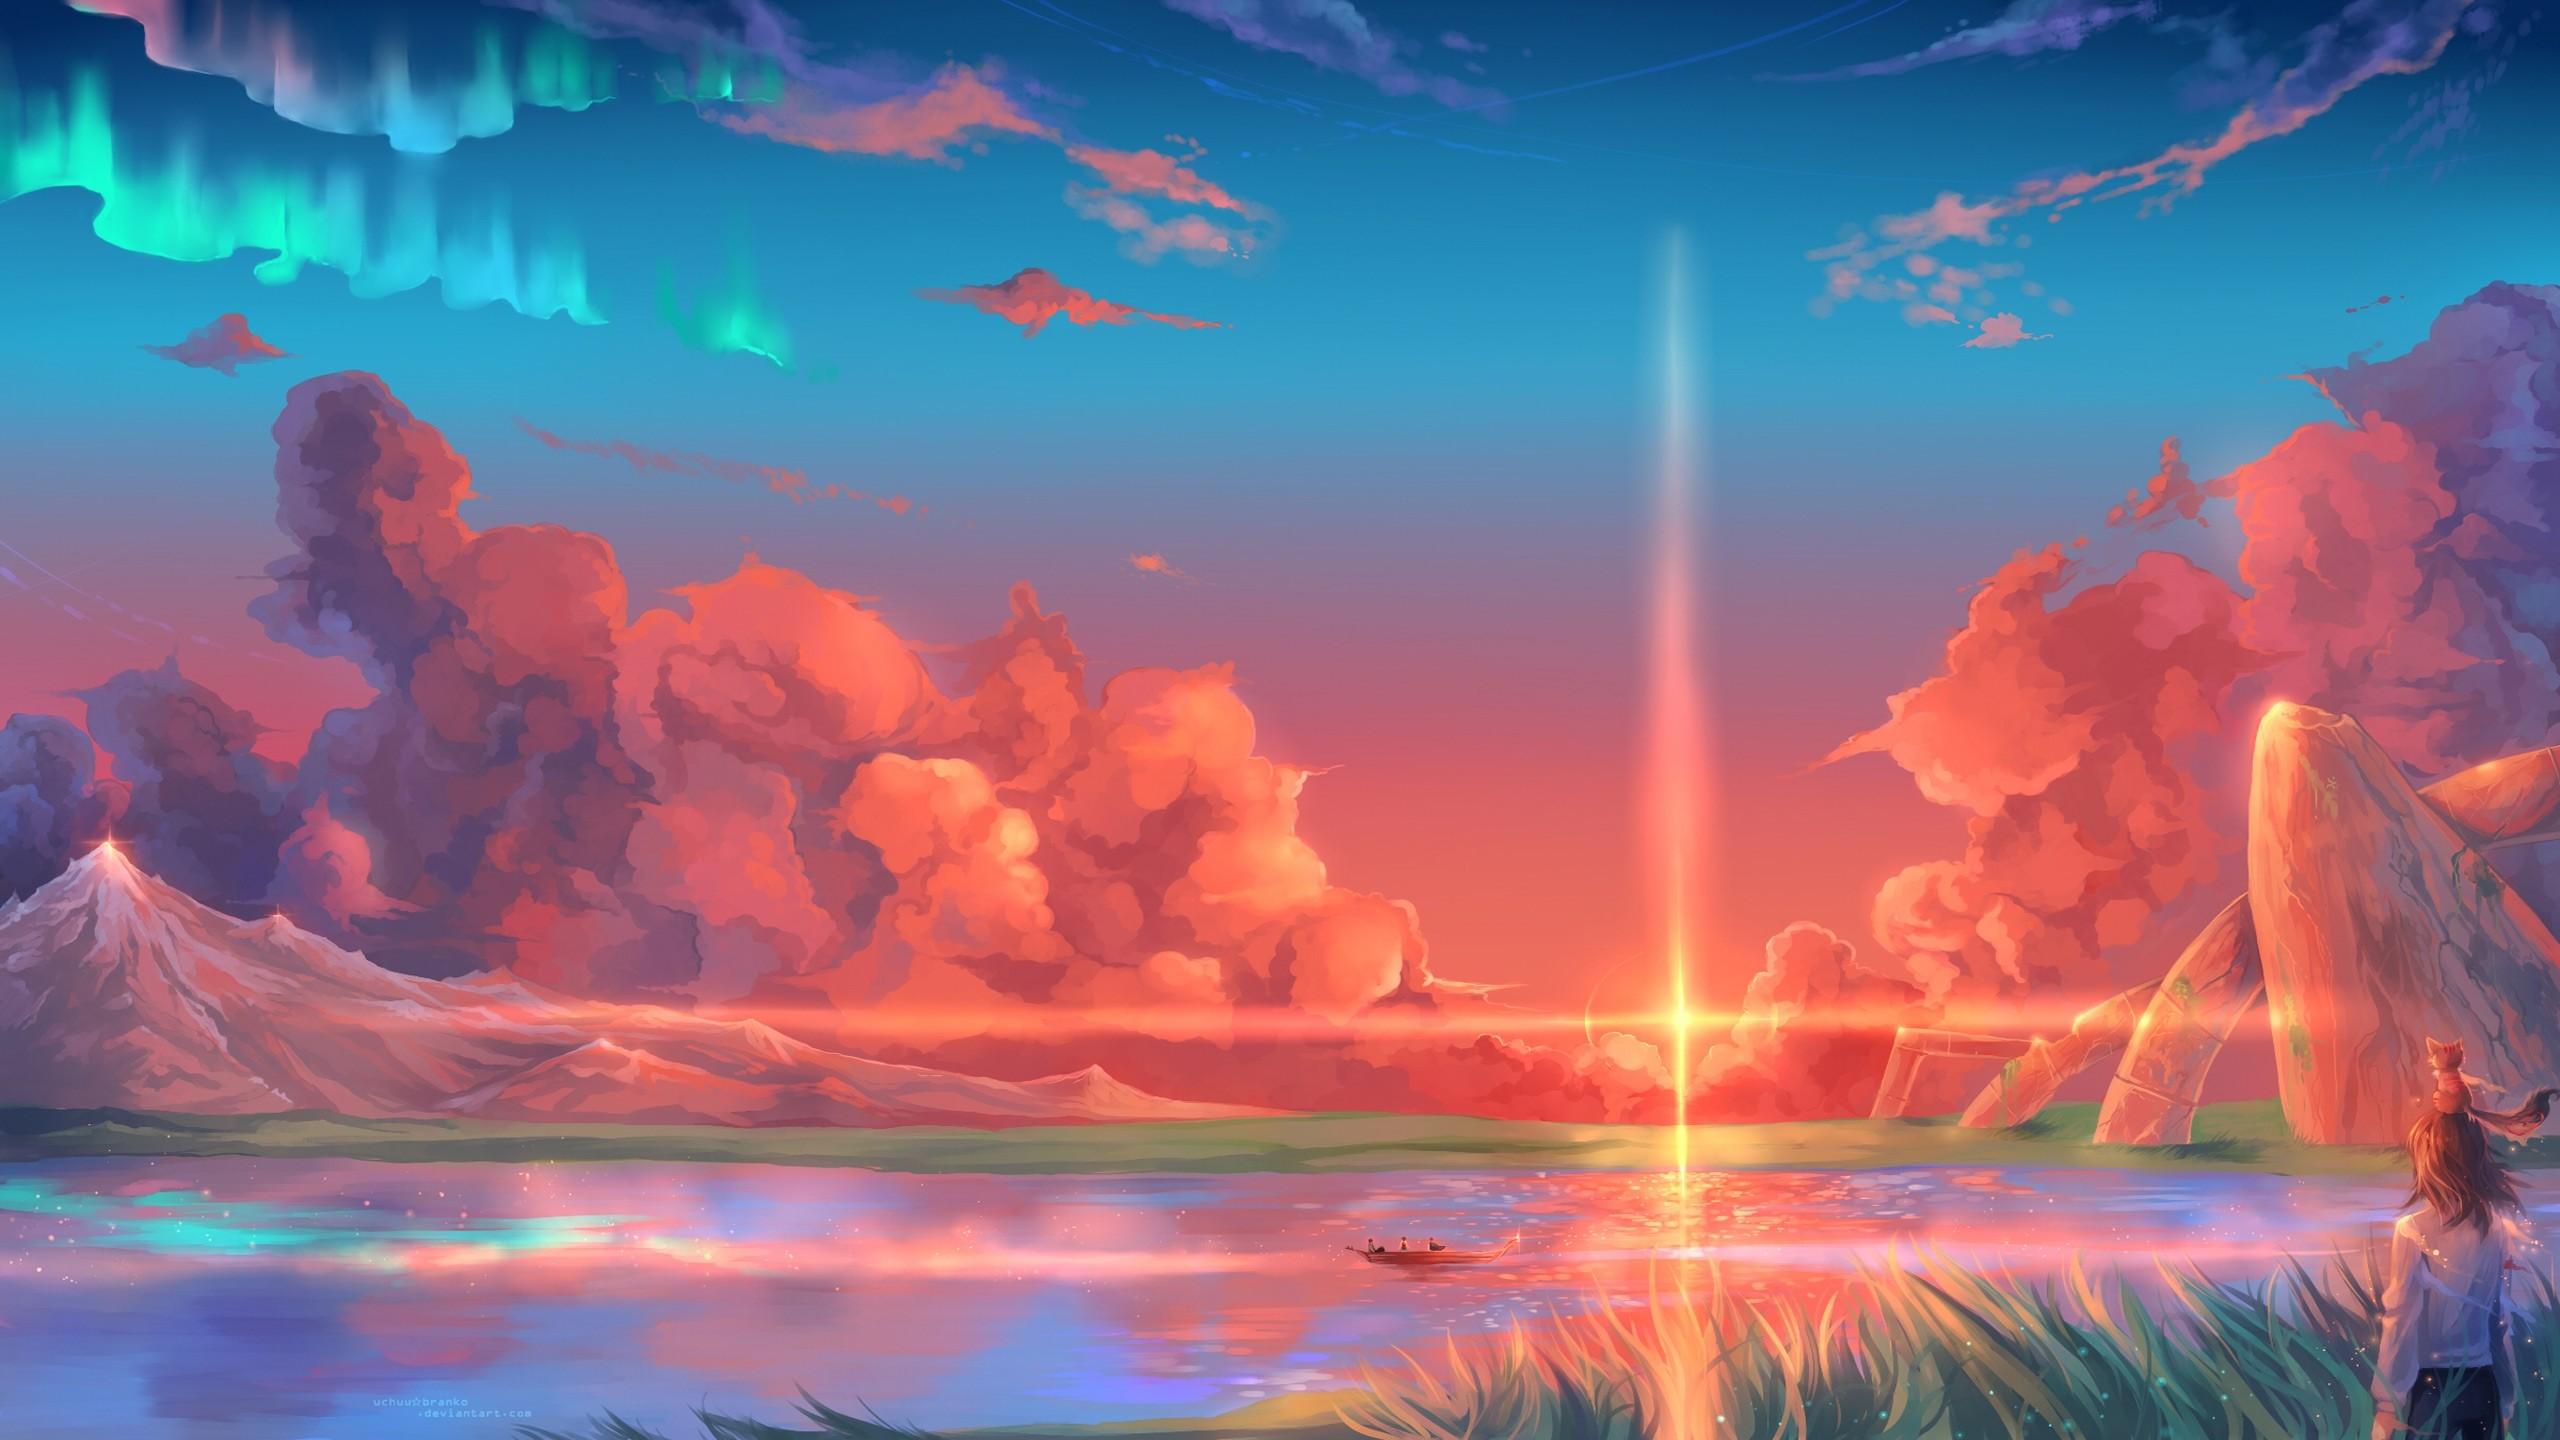 Res: 2560x1440, New Anime Fantasy Wallpaper Desktop Gallery - Free Anime Fantasy World  puter desktop hd wallpapers pictures